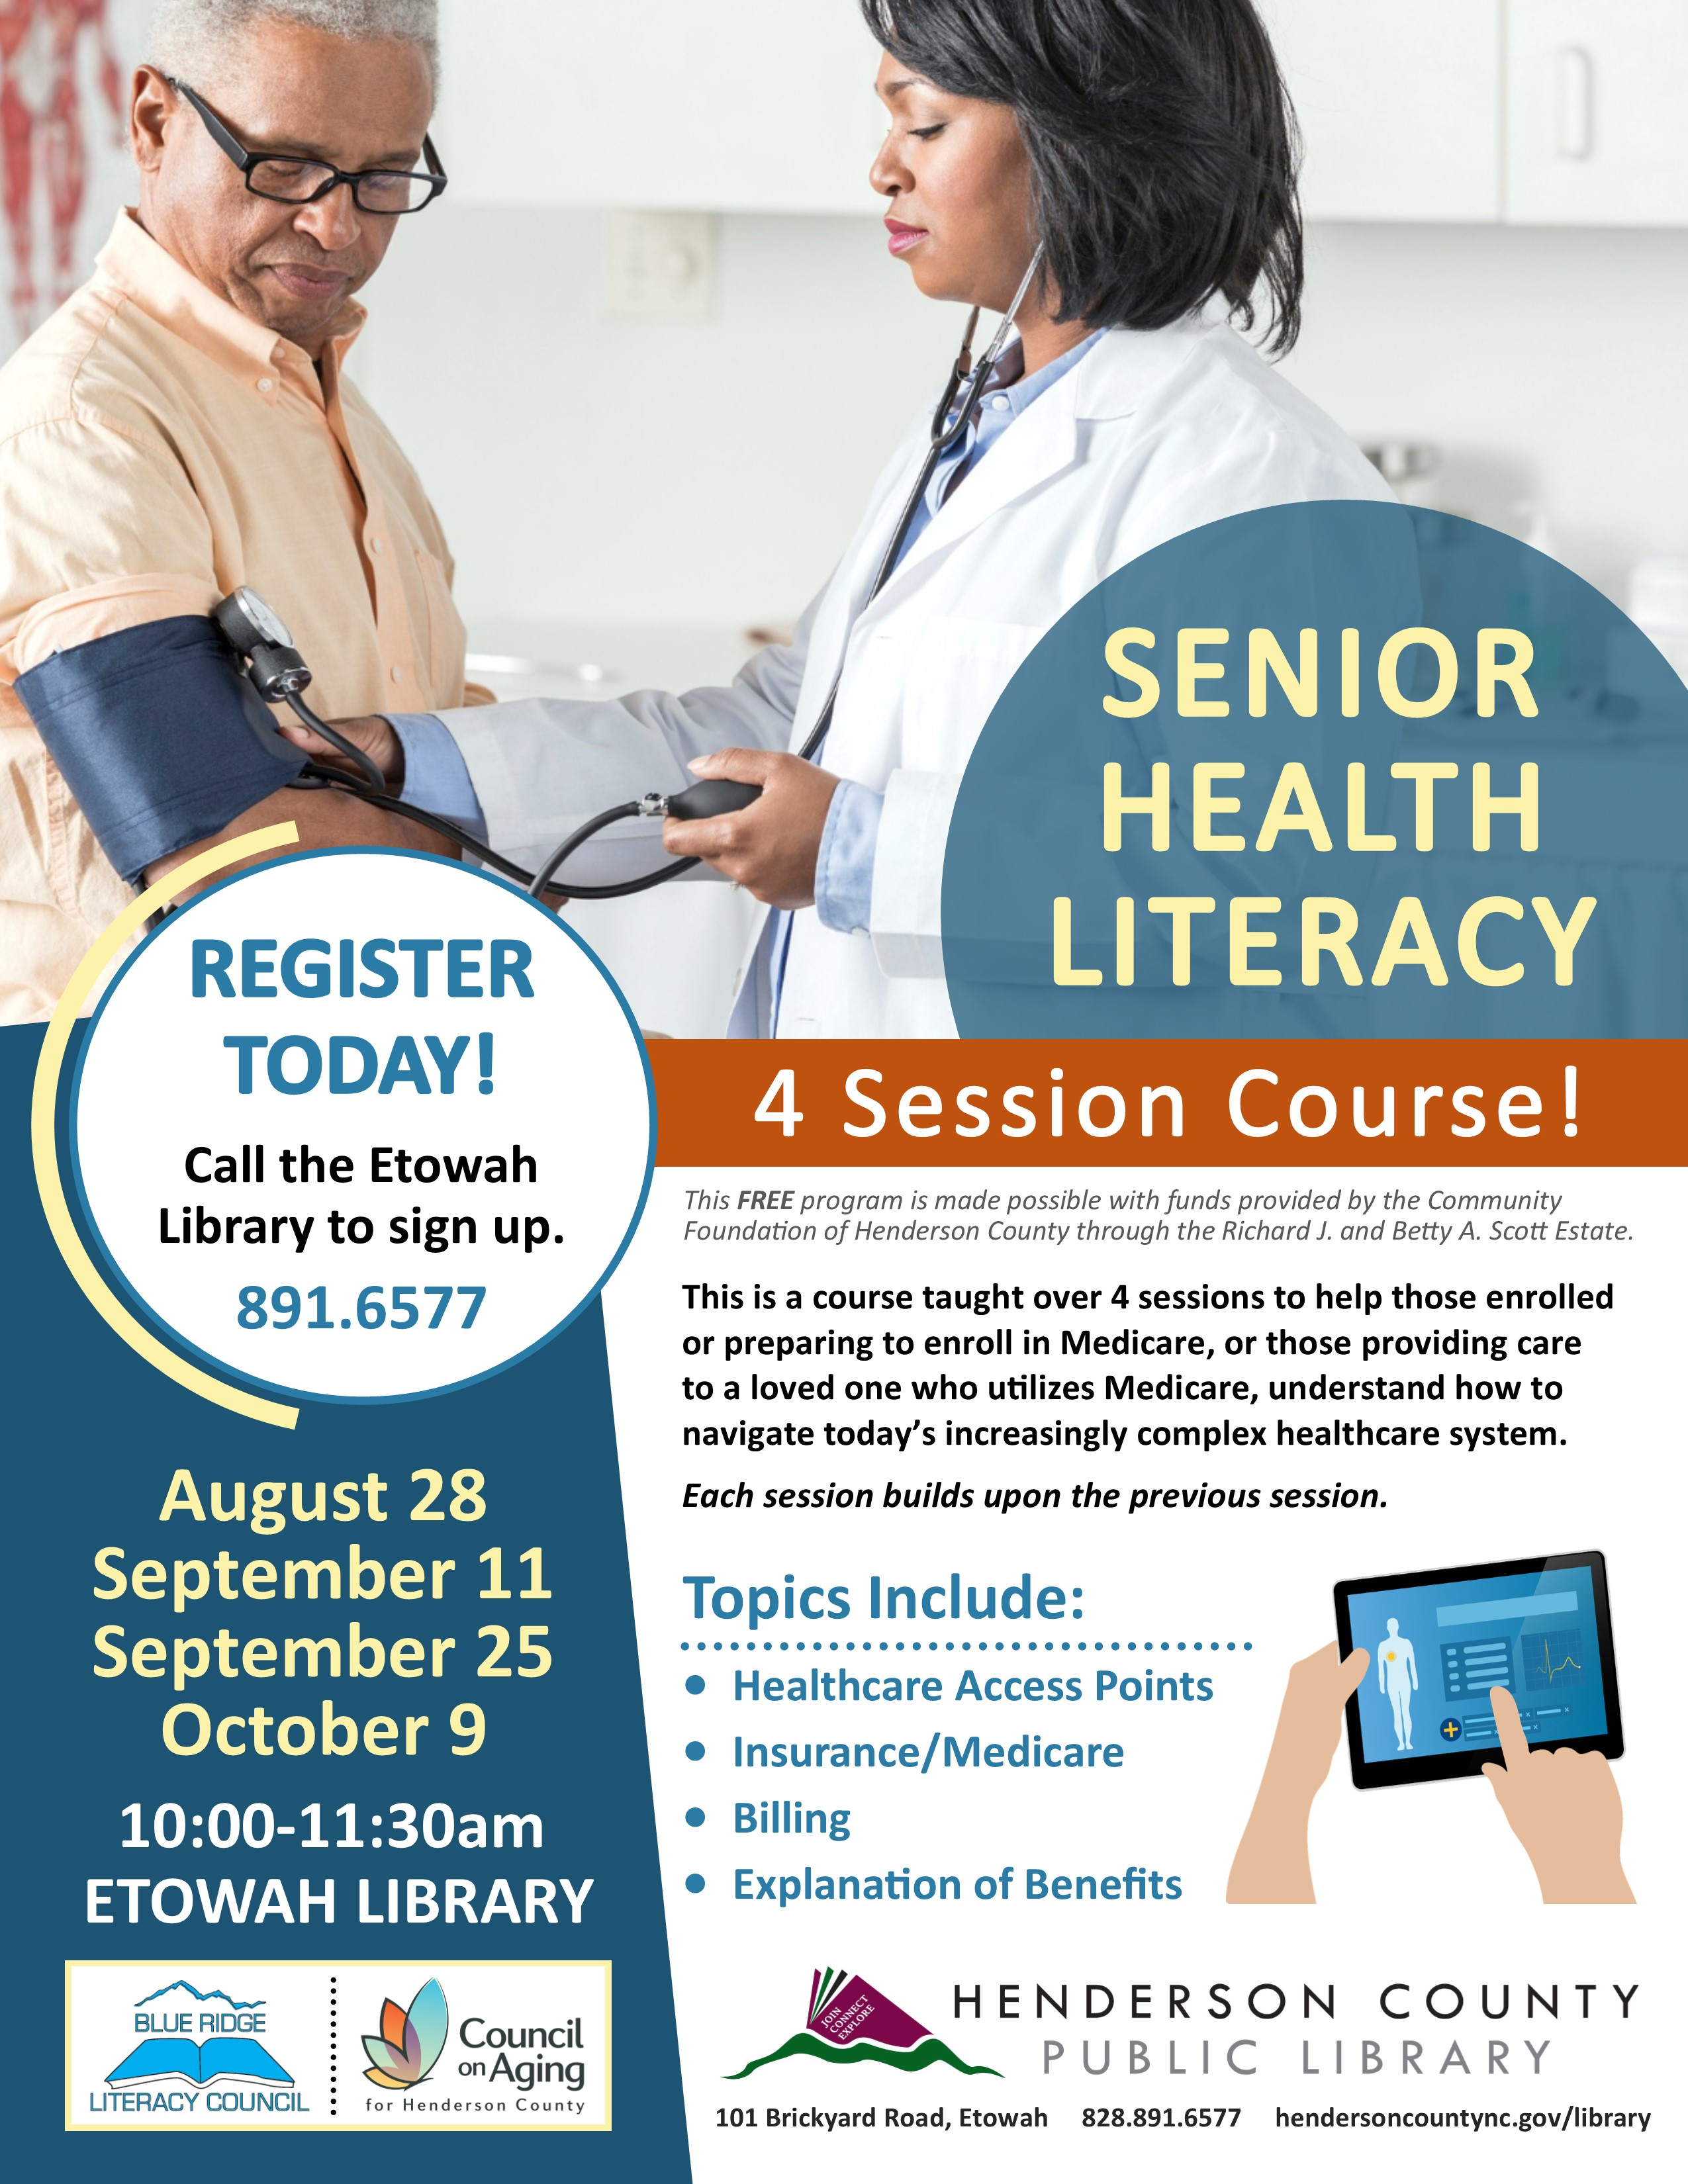 Senior Health Literacy Course